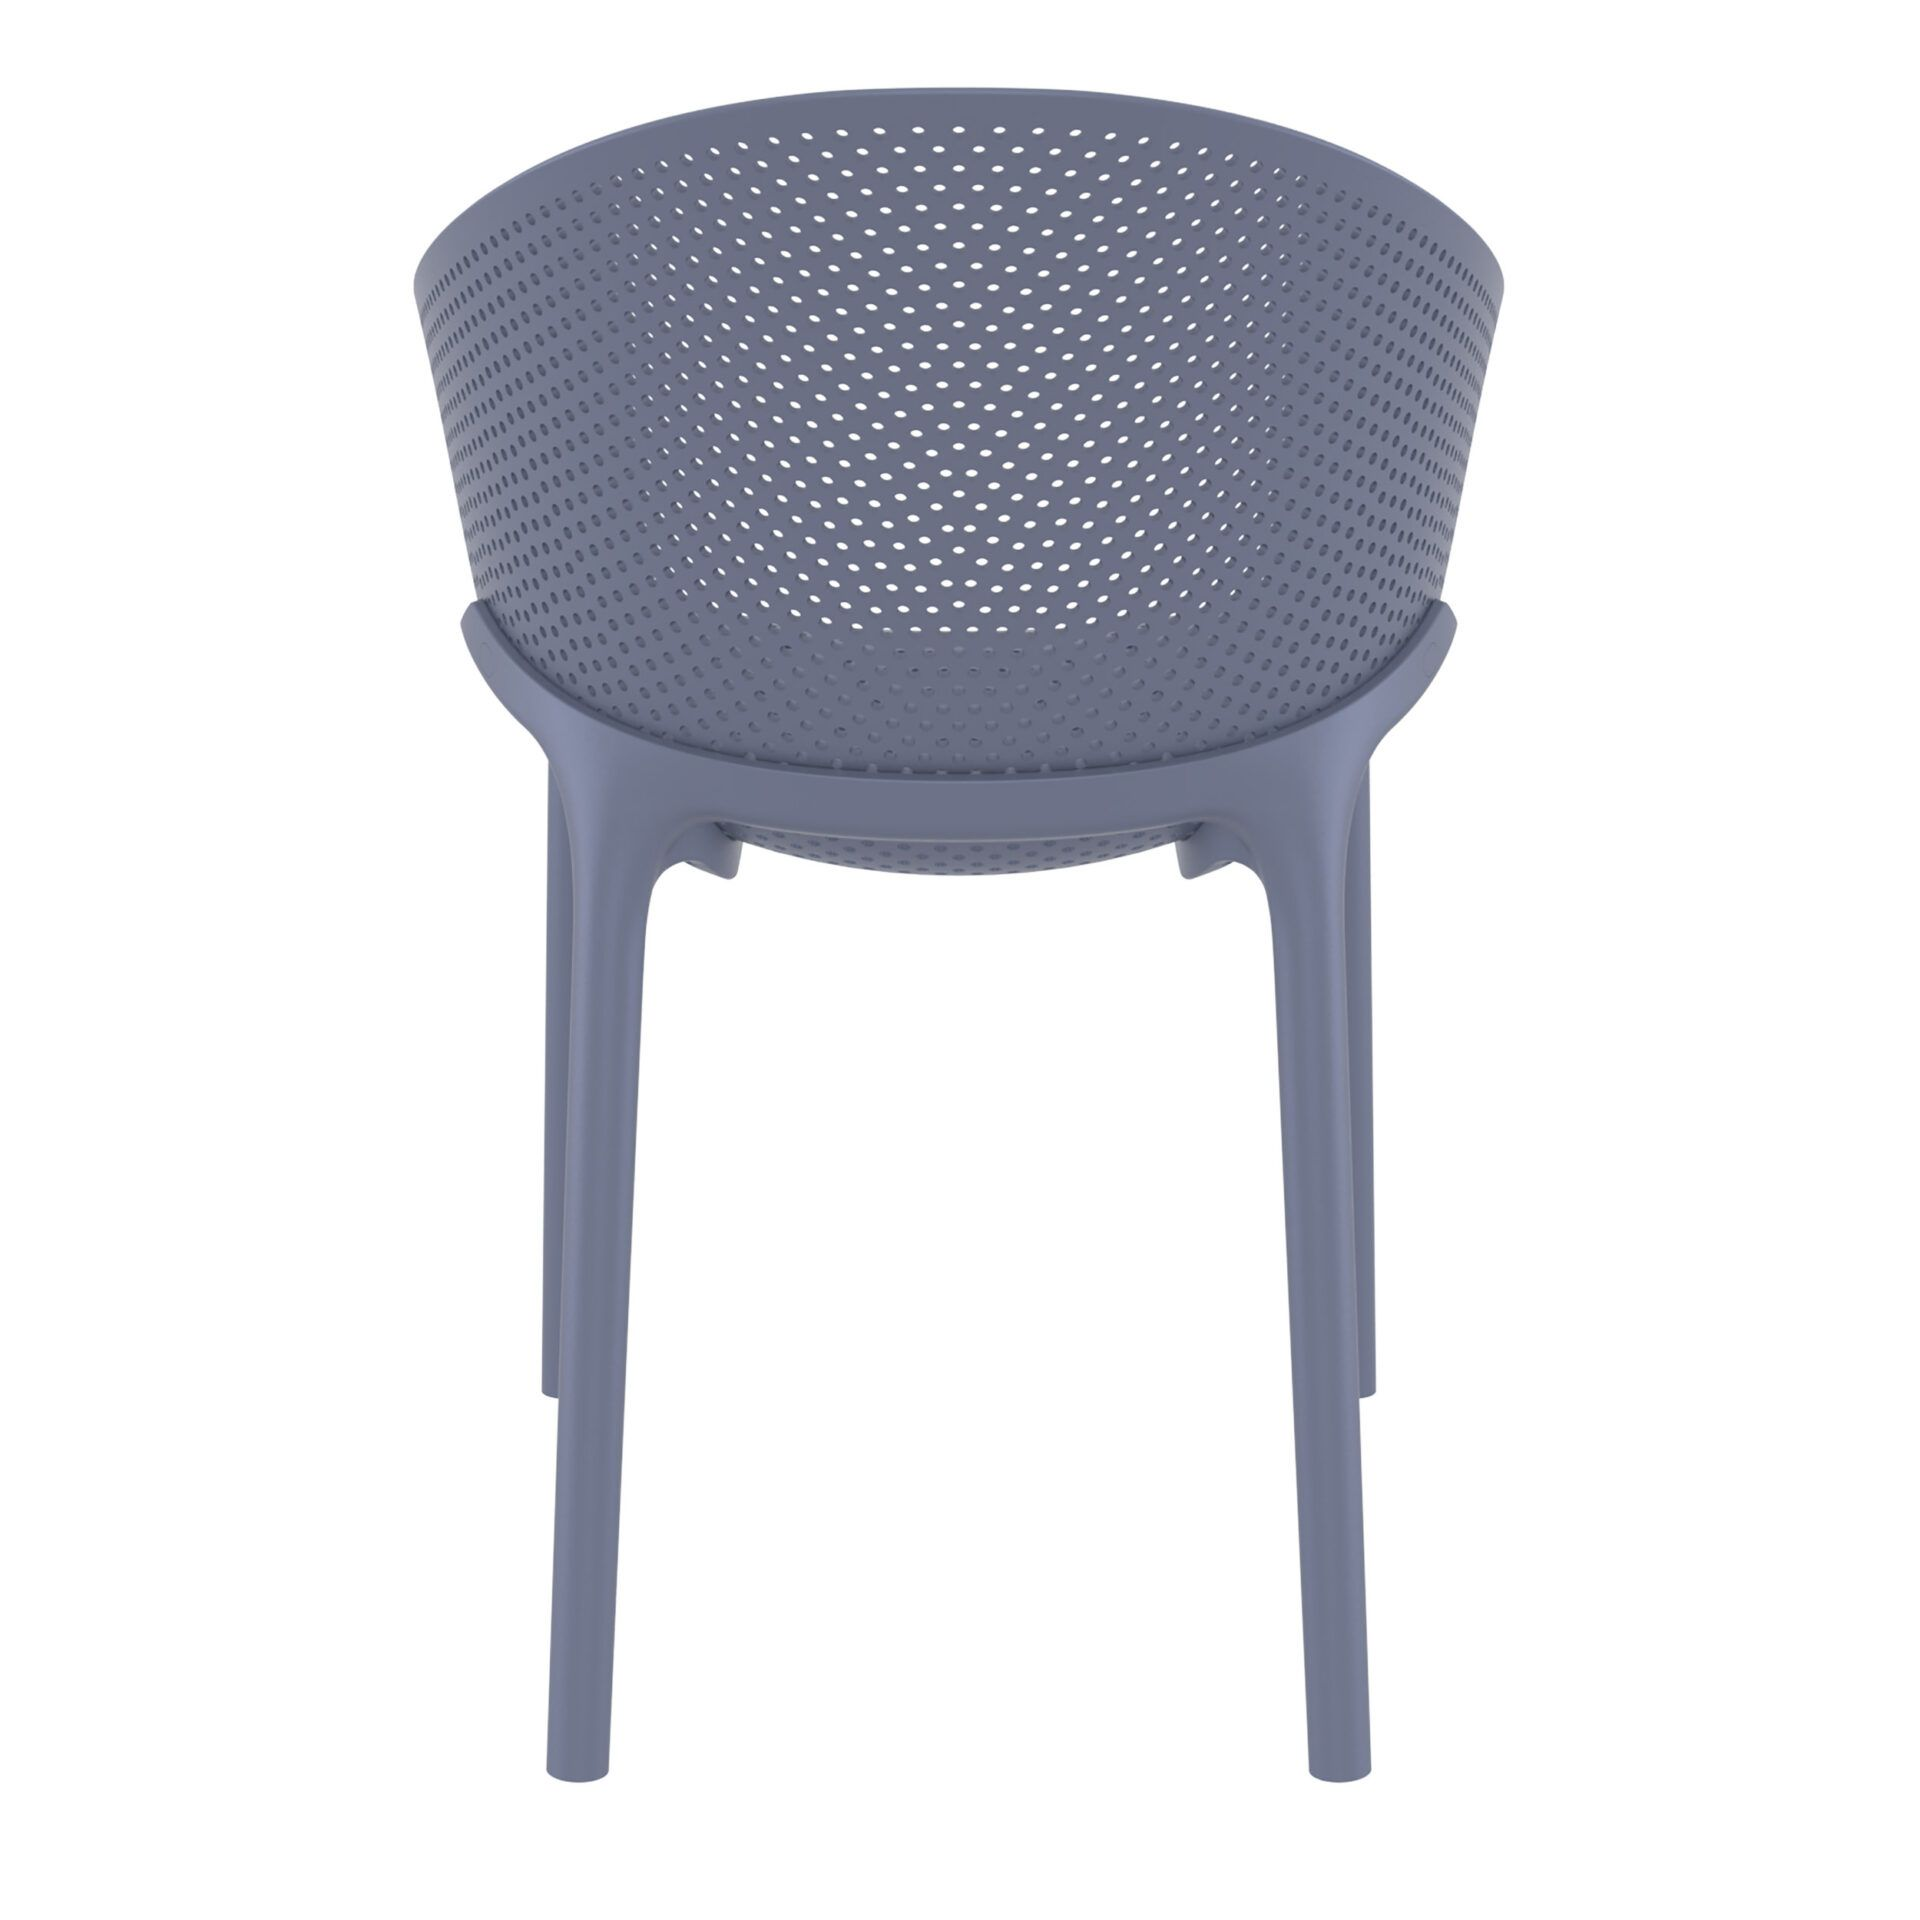 outdoor seating polypropylene sky chair darkgrey back